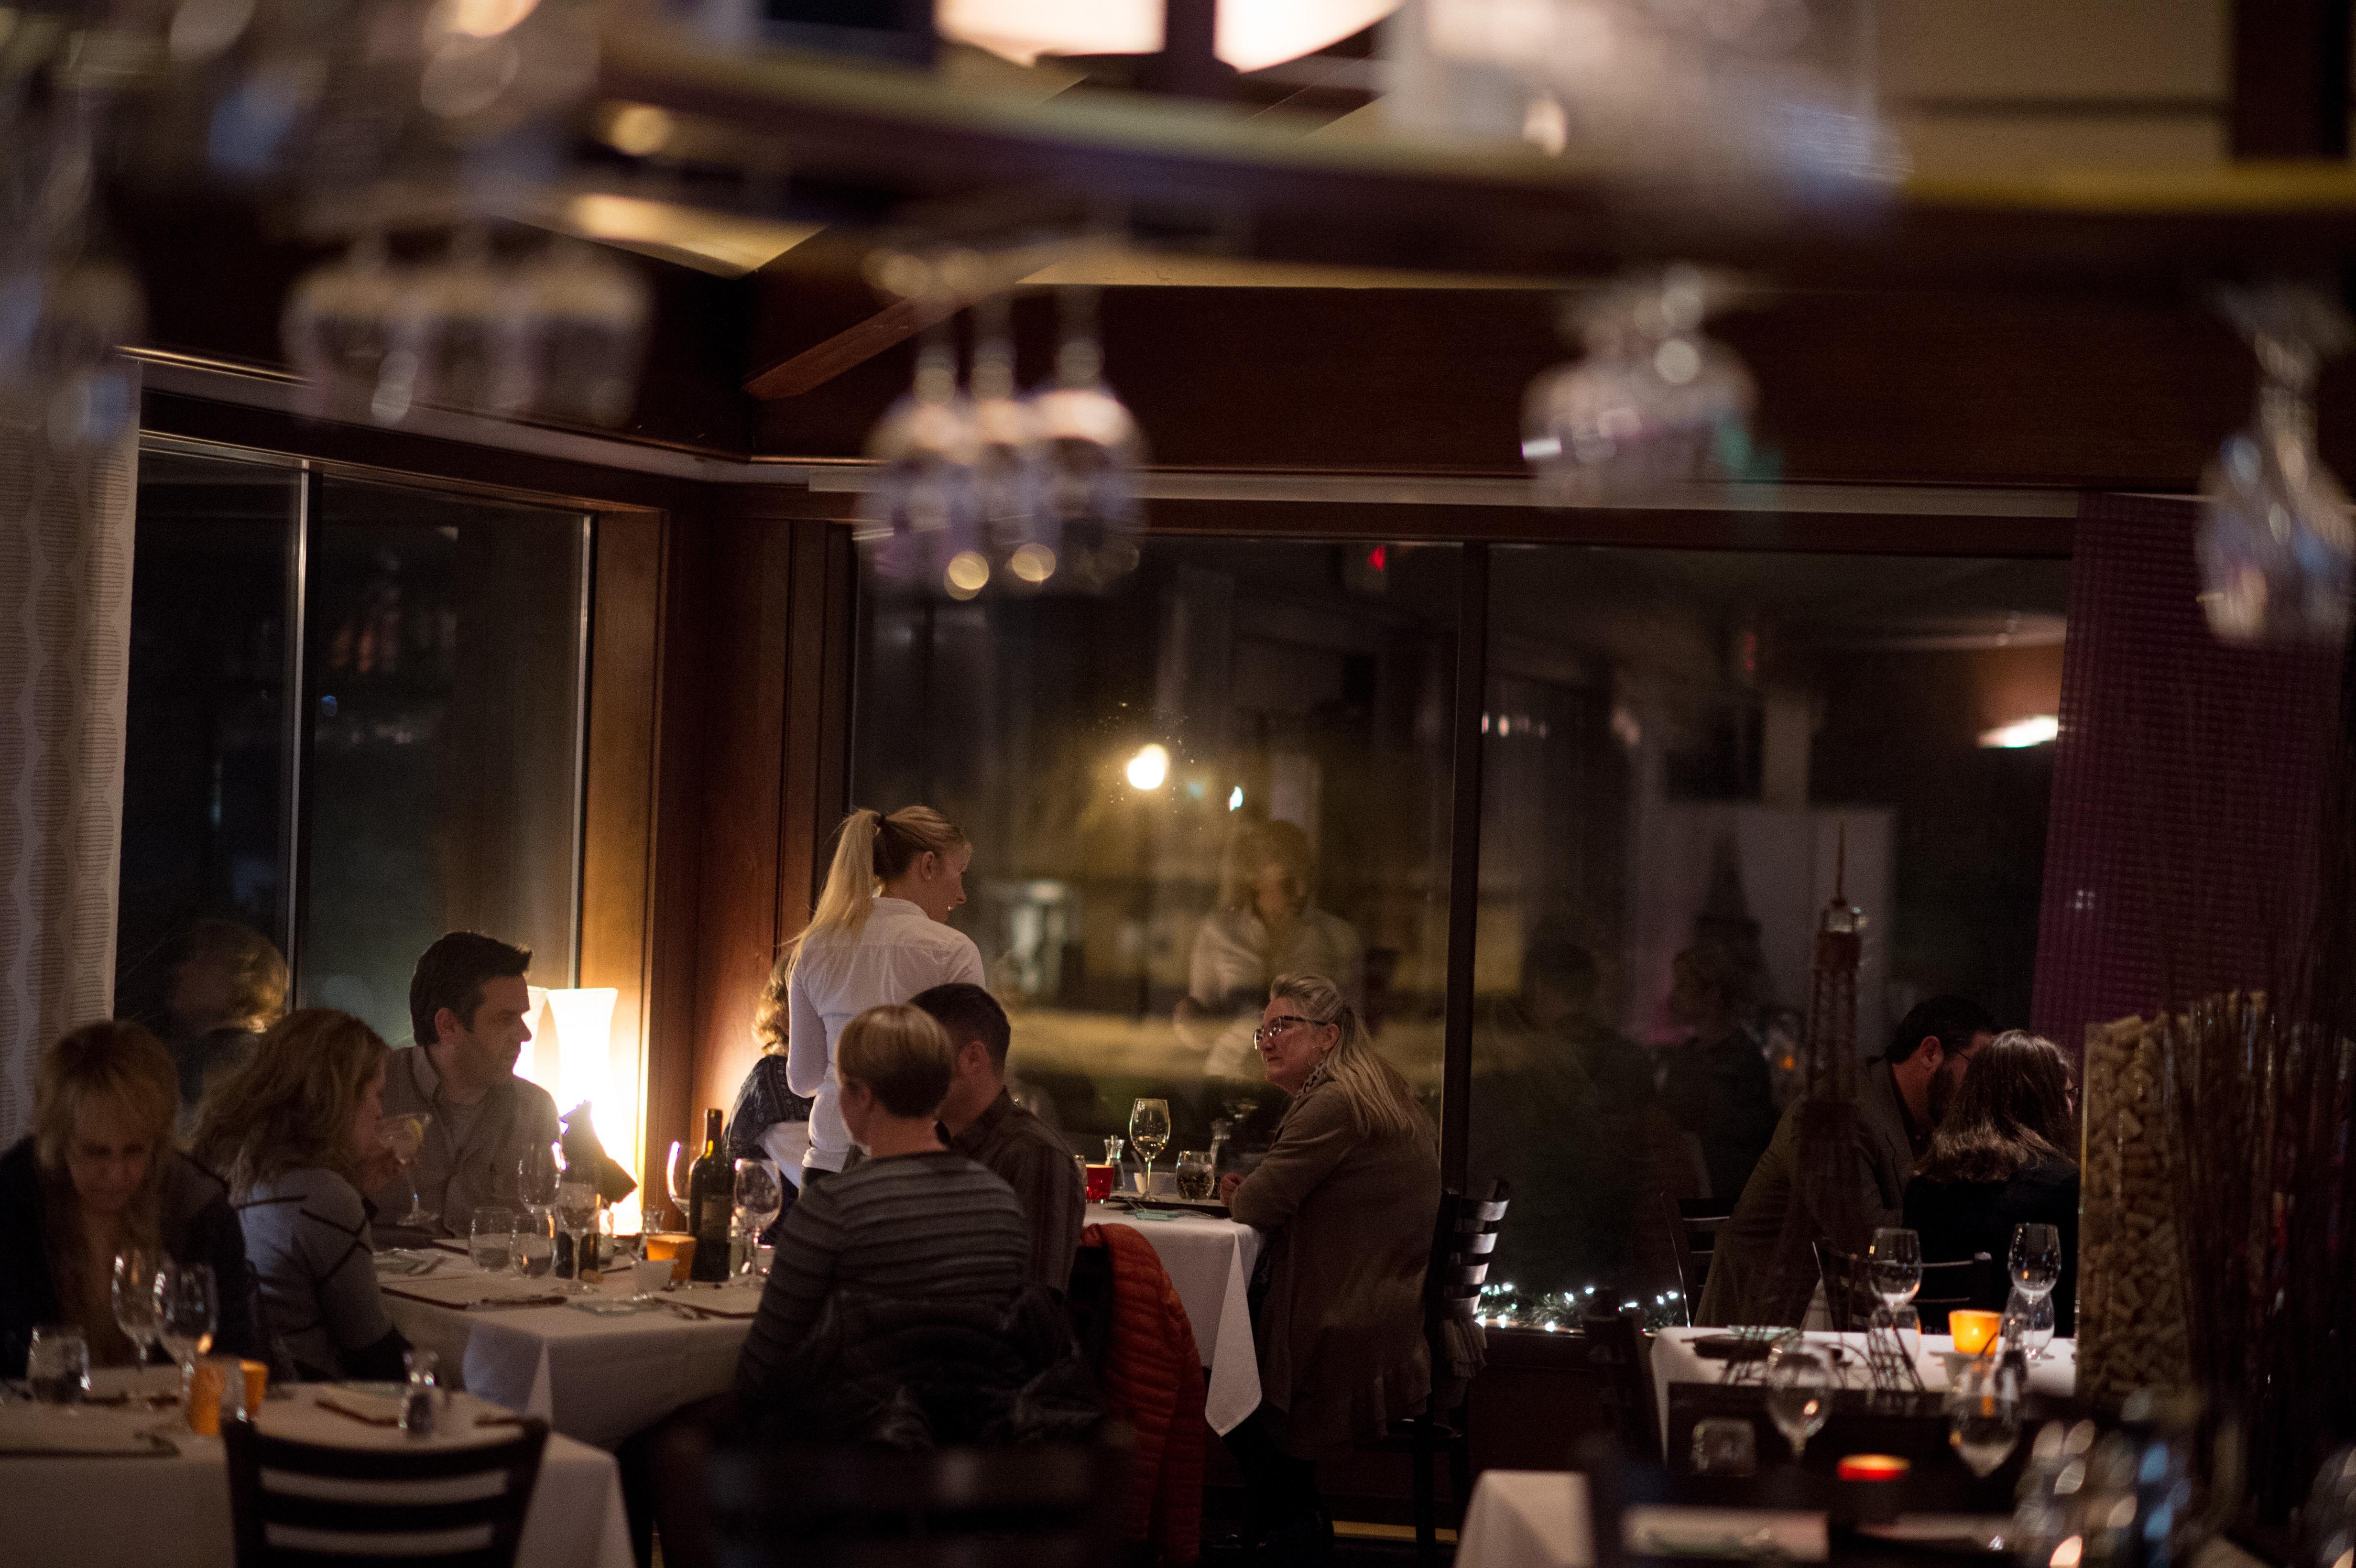 seven of spokane's most romantic restaurants, plus a few honorable